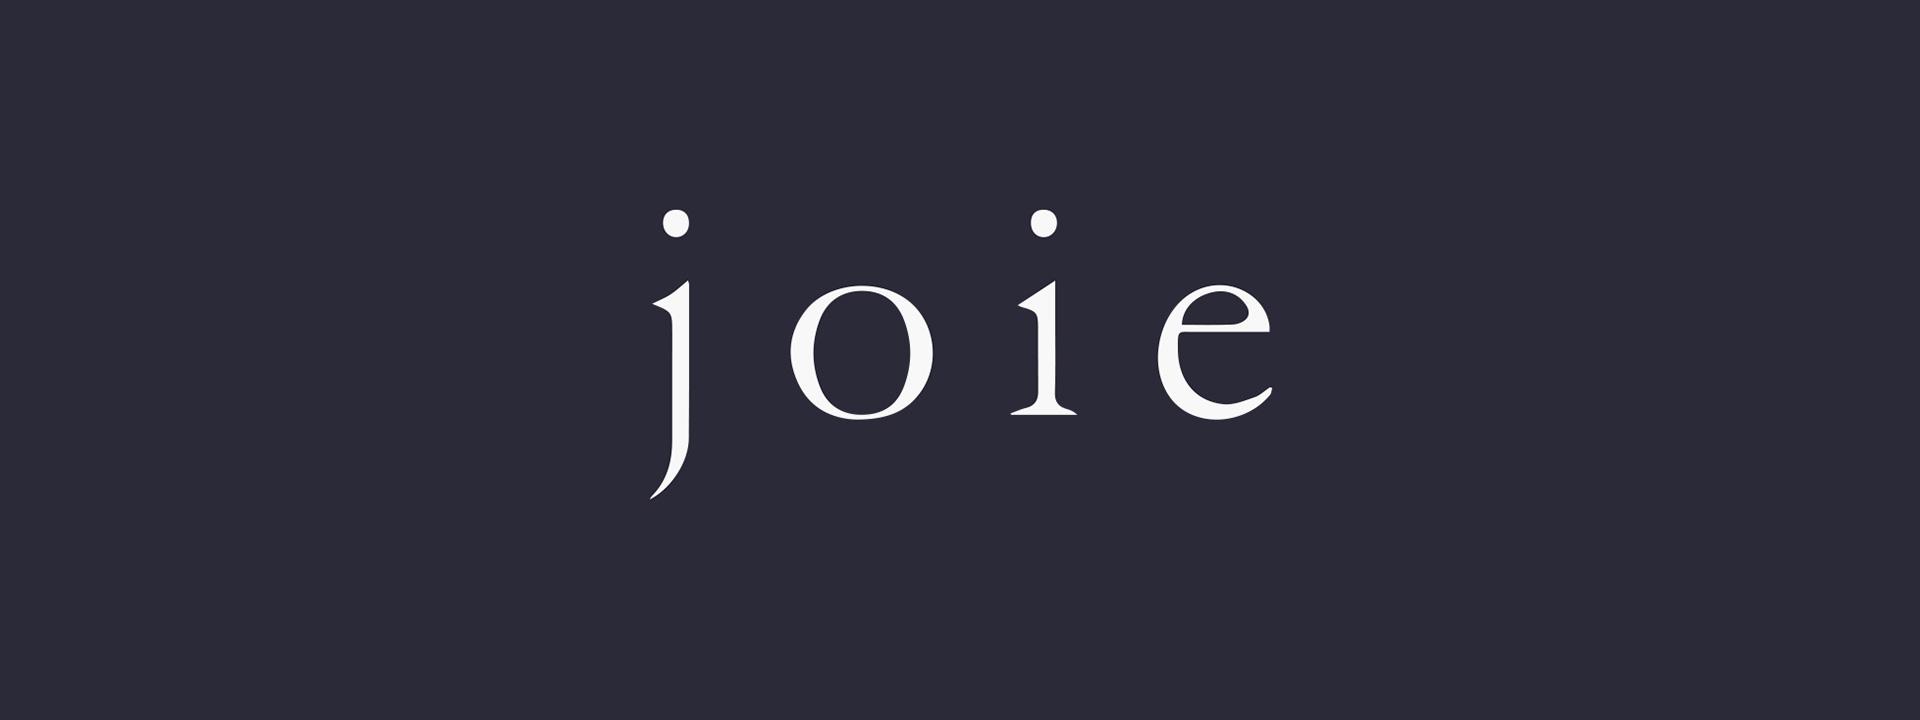 joie visual merchandising installation